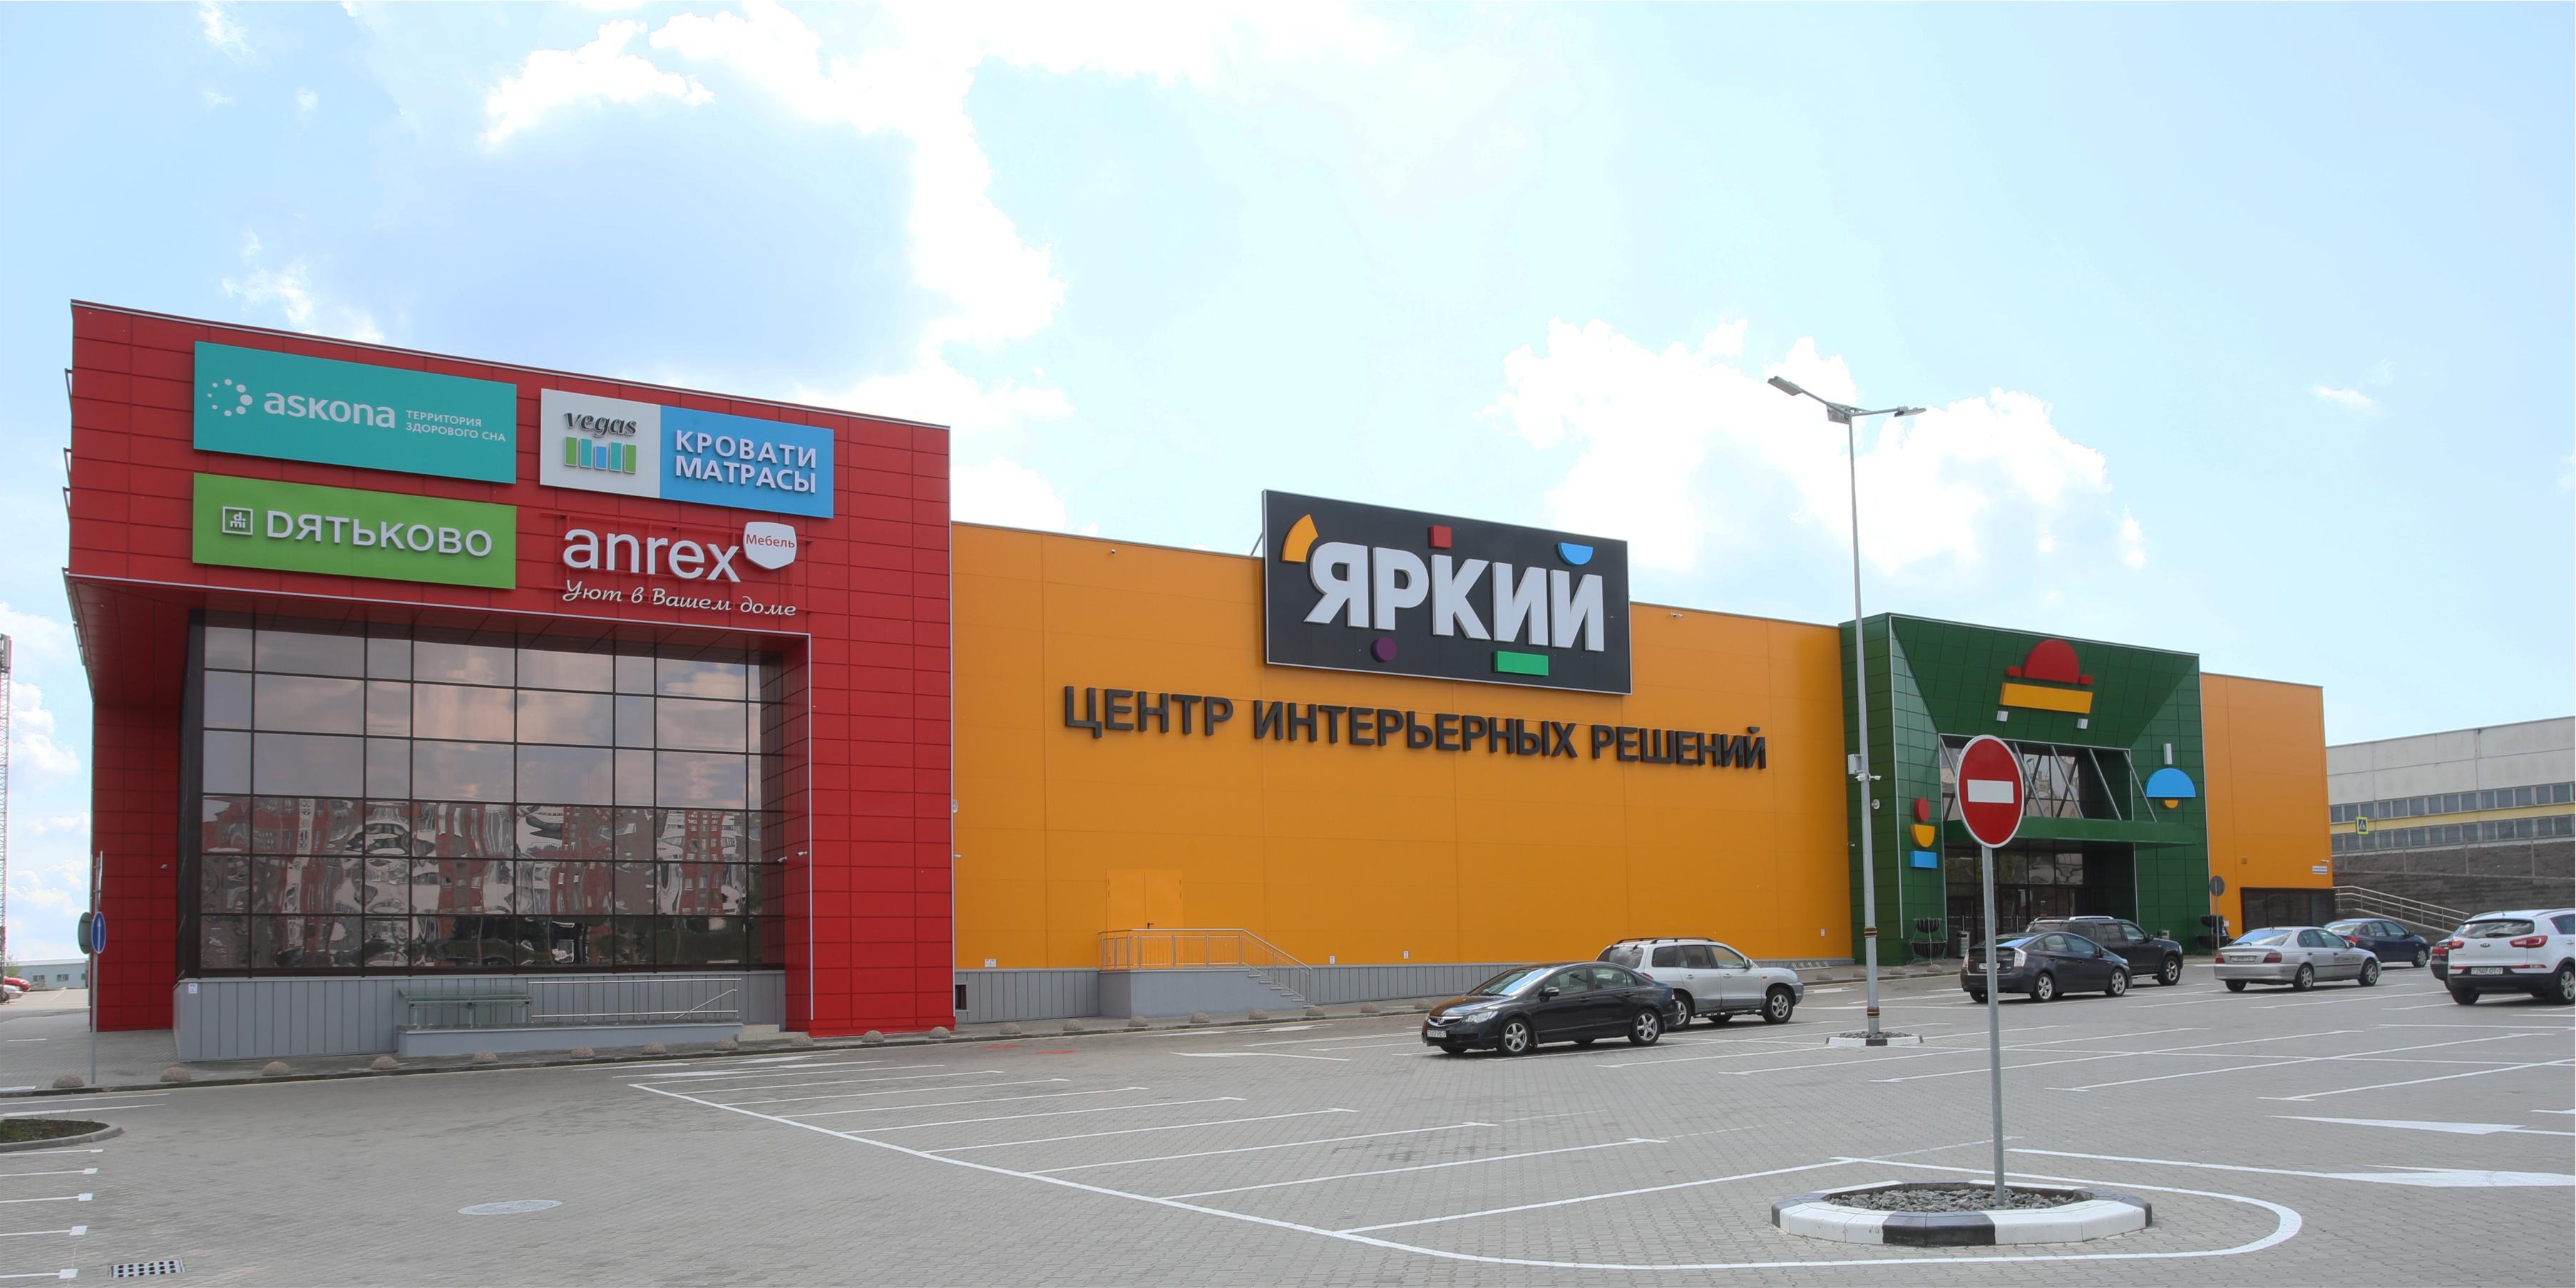 ТЦ «Яркий», г. Минск 3004